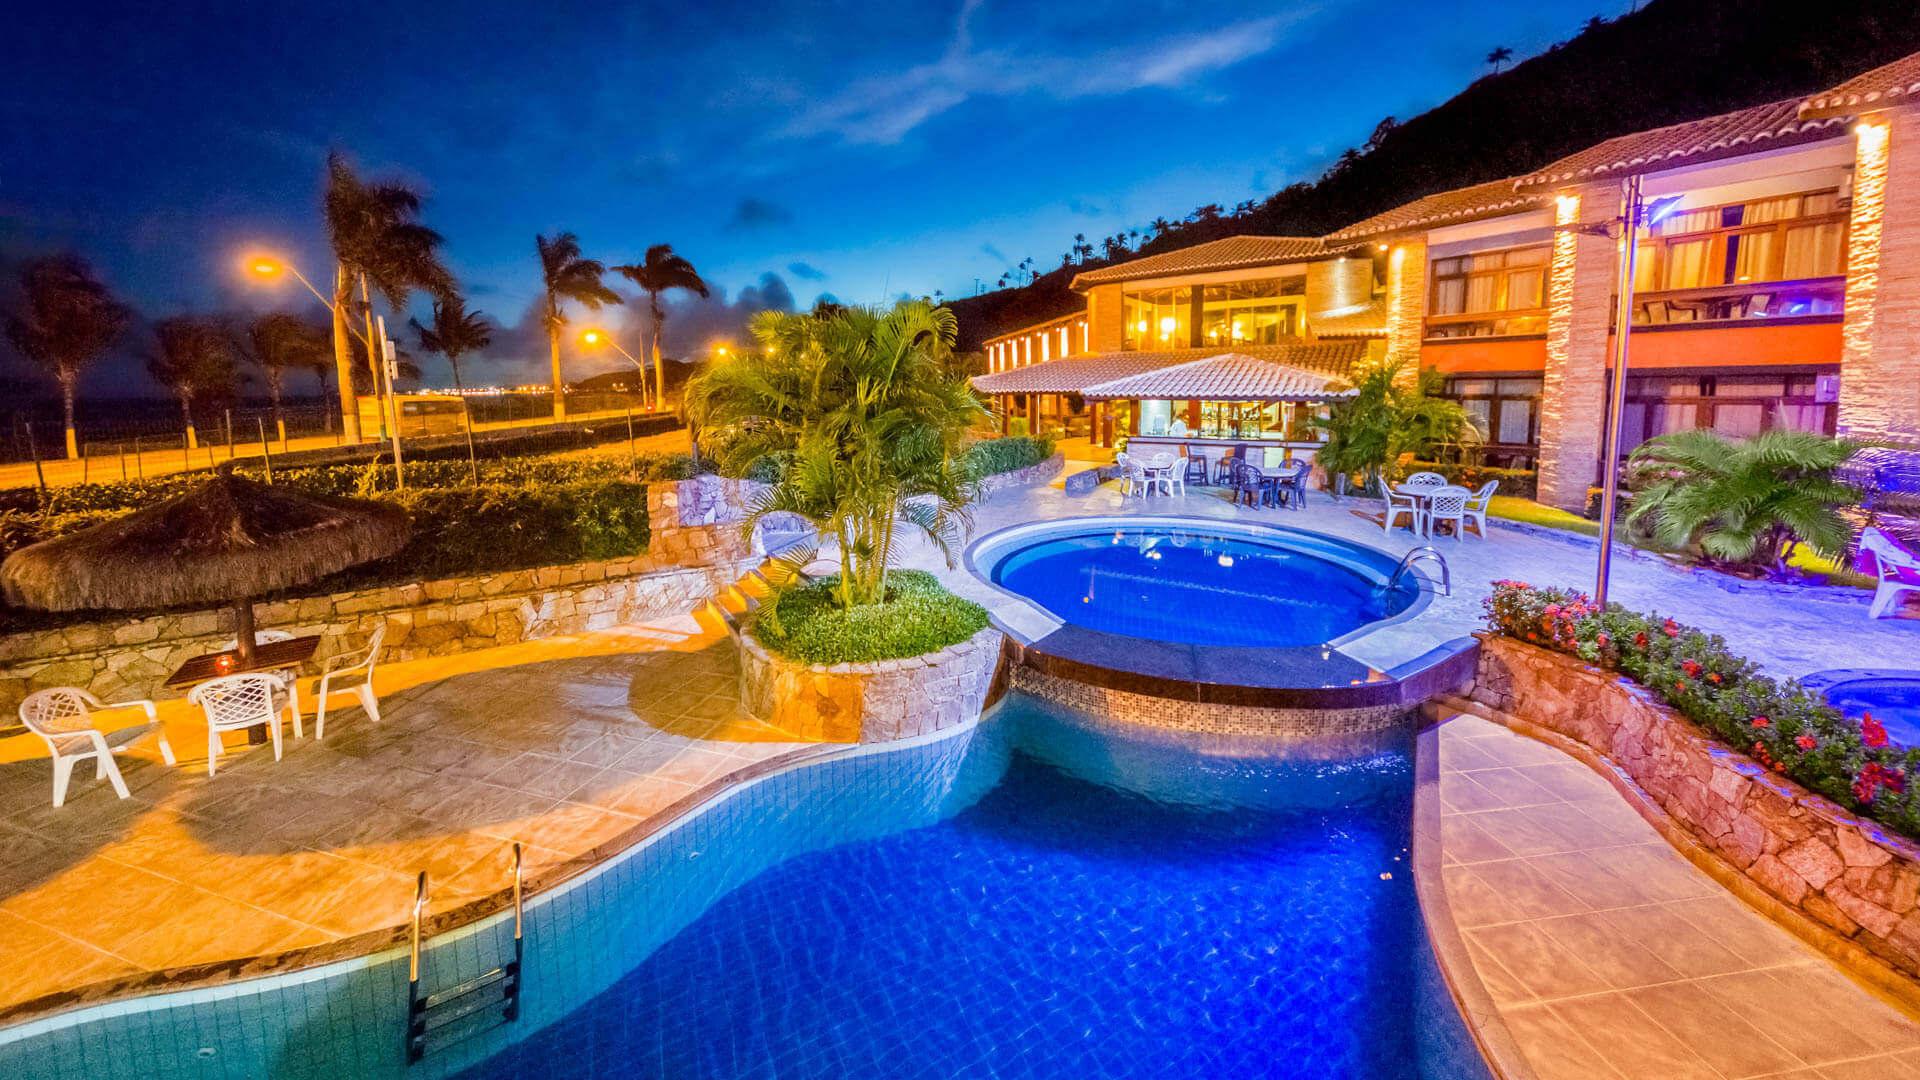 Piscina do Hotel Quinta do Sol